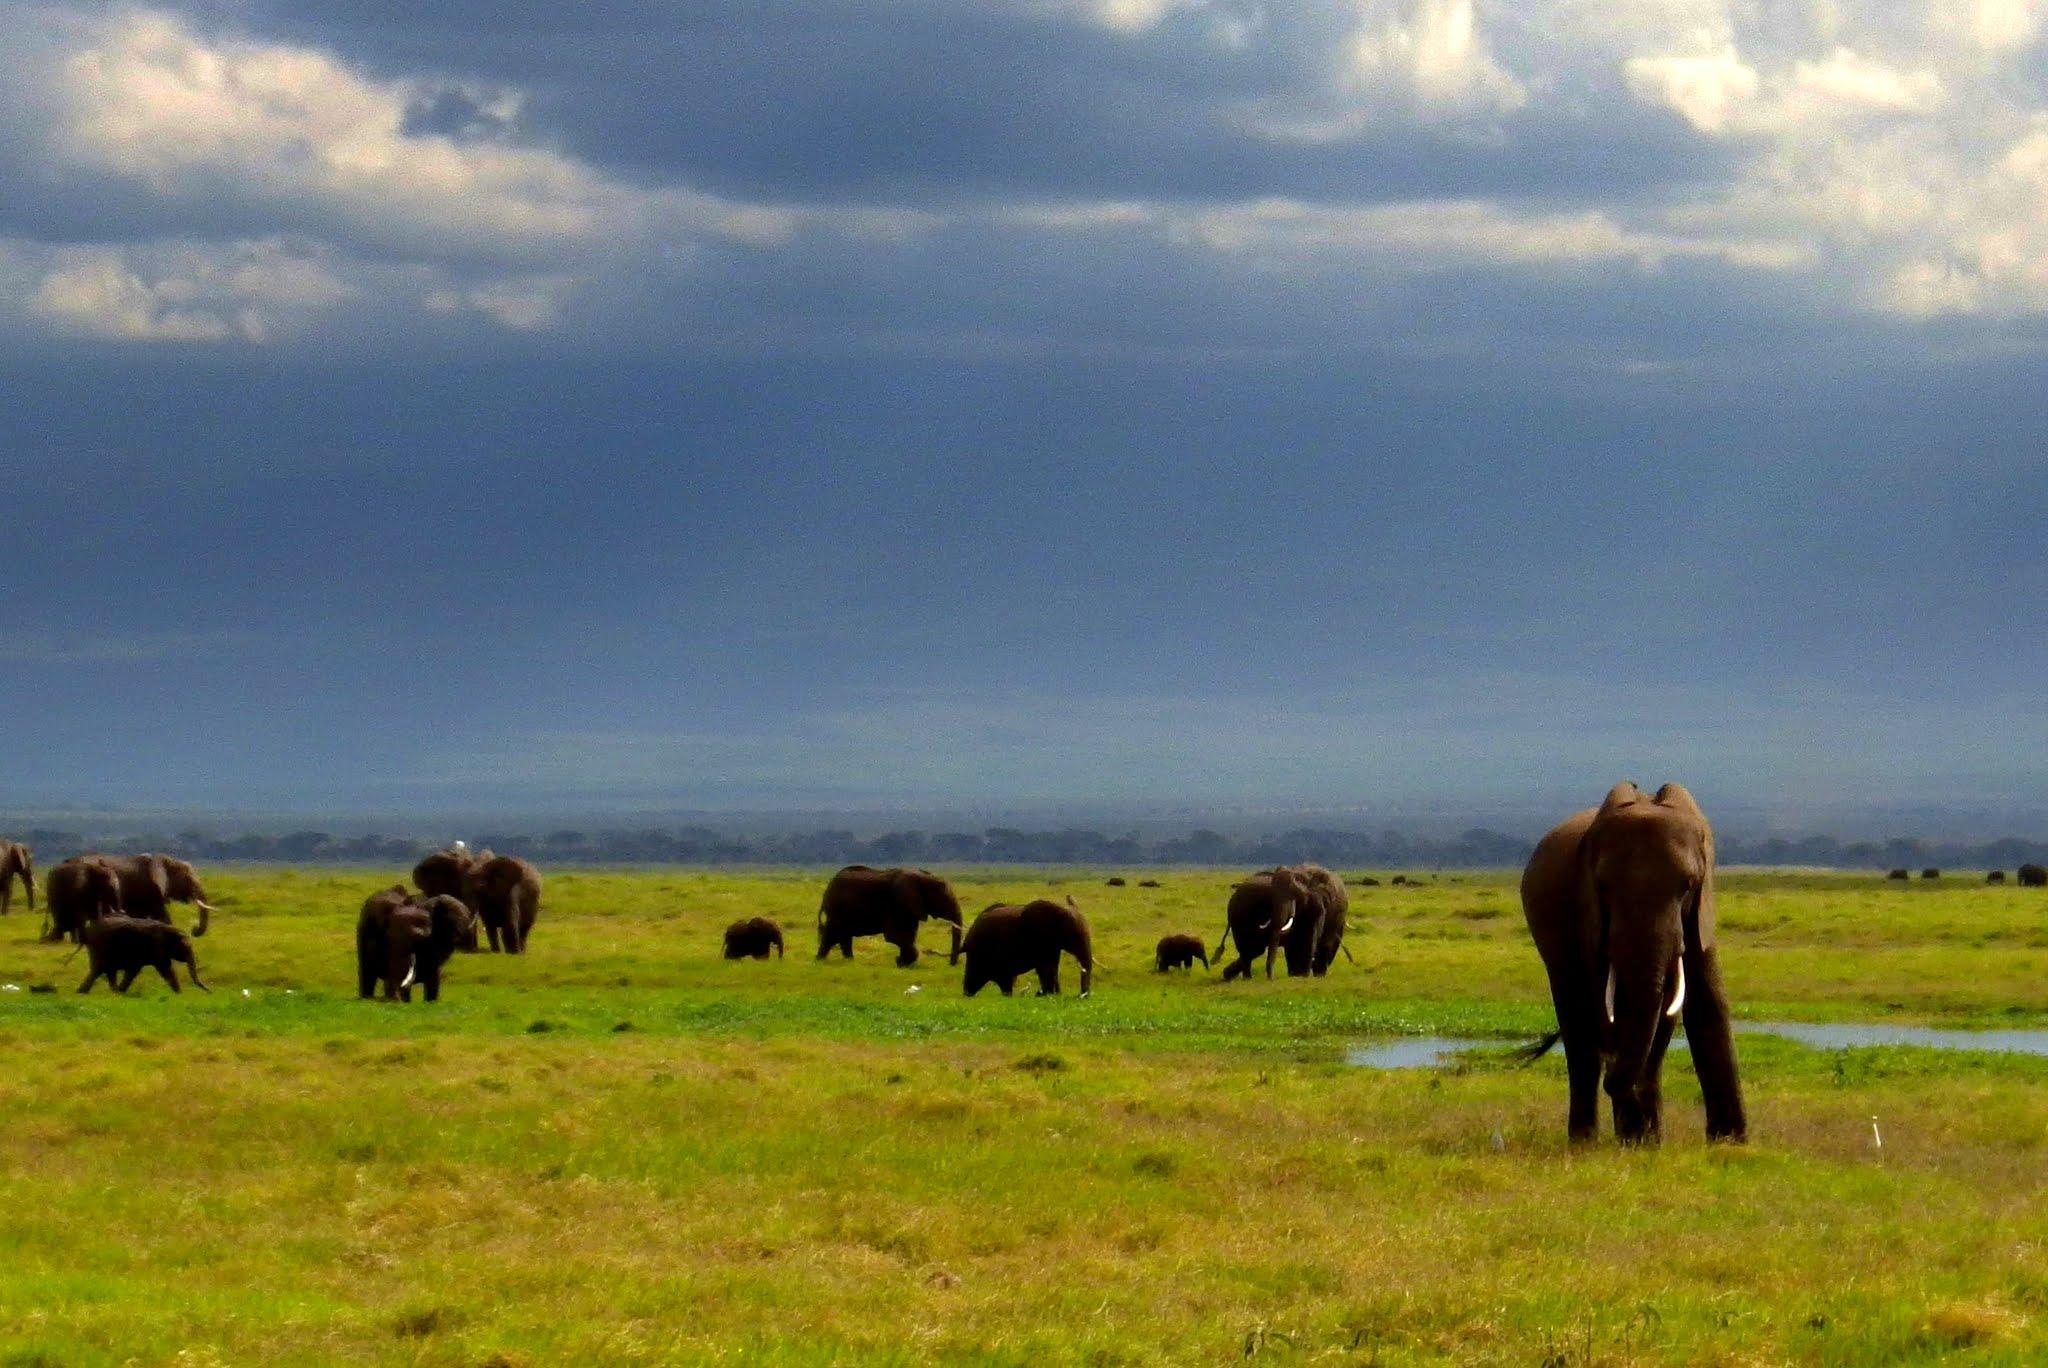 "Obrázok 2. Stádo ""ekologických inžinierov"" - slonov, Amboseli, Keňa. (Foto M. Hromada)"